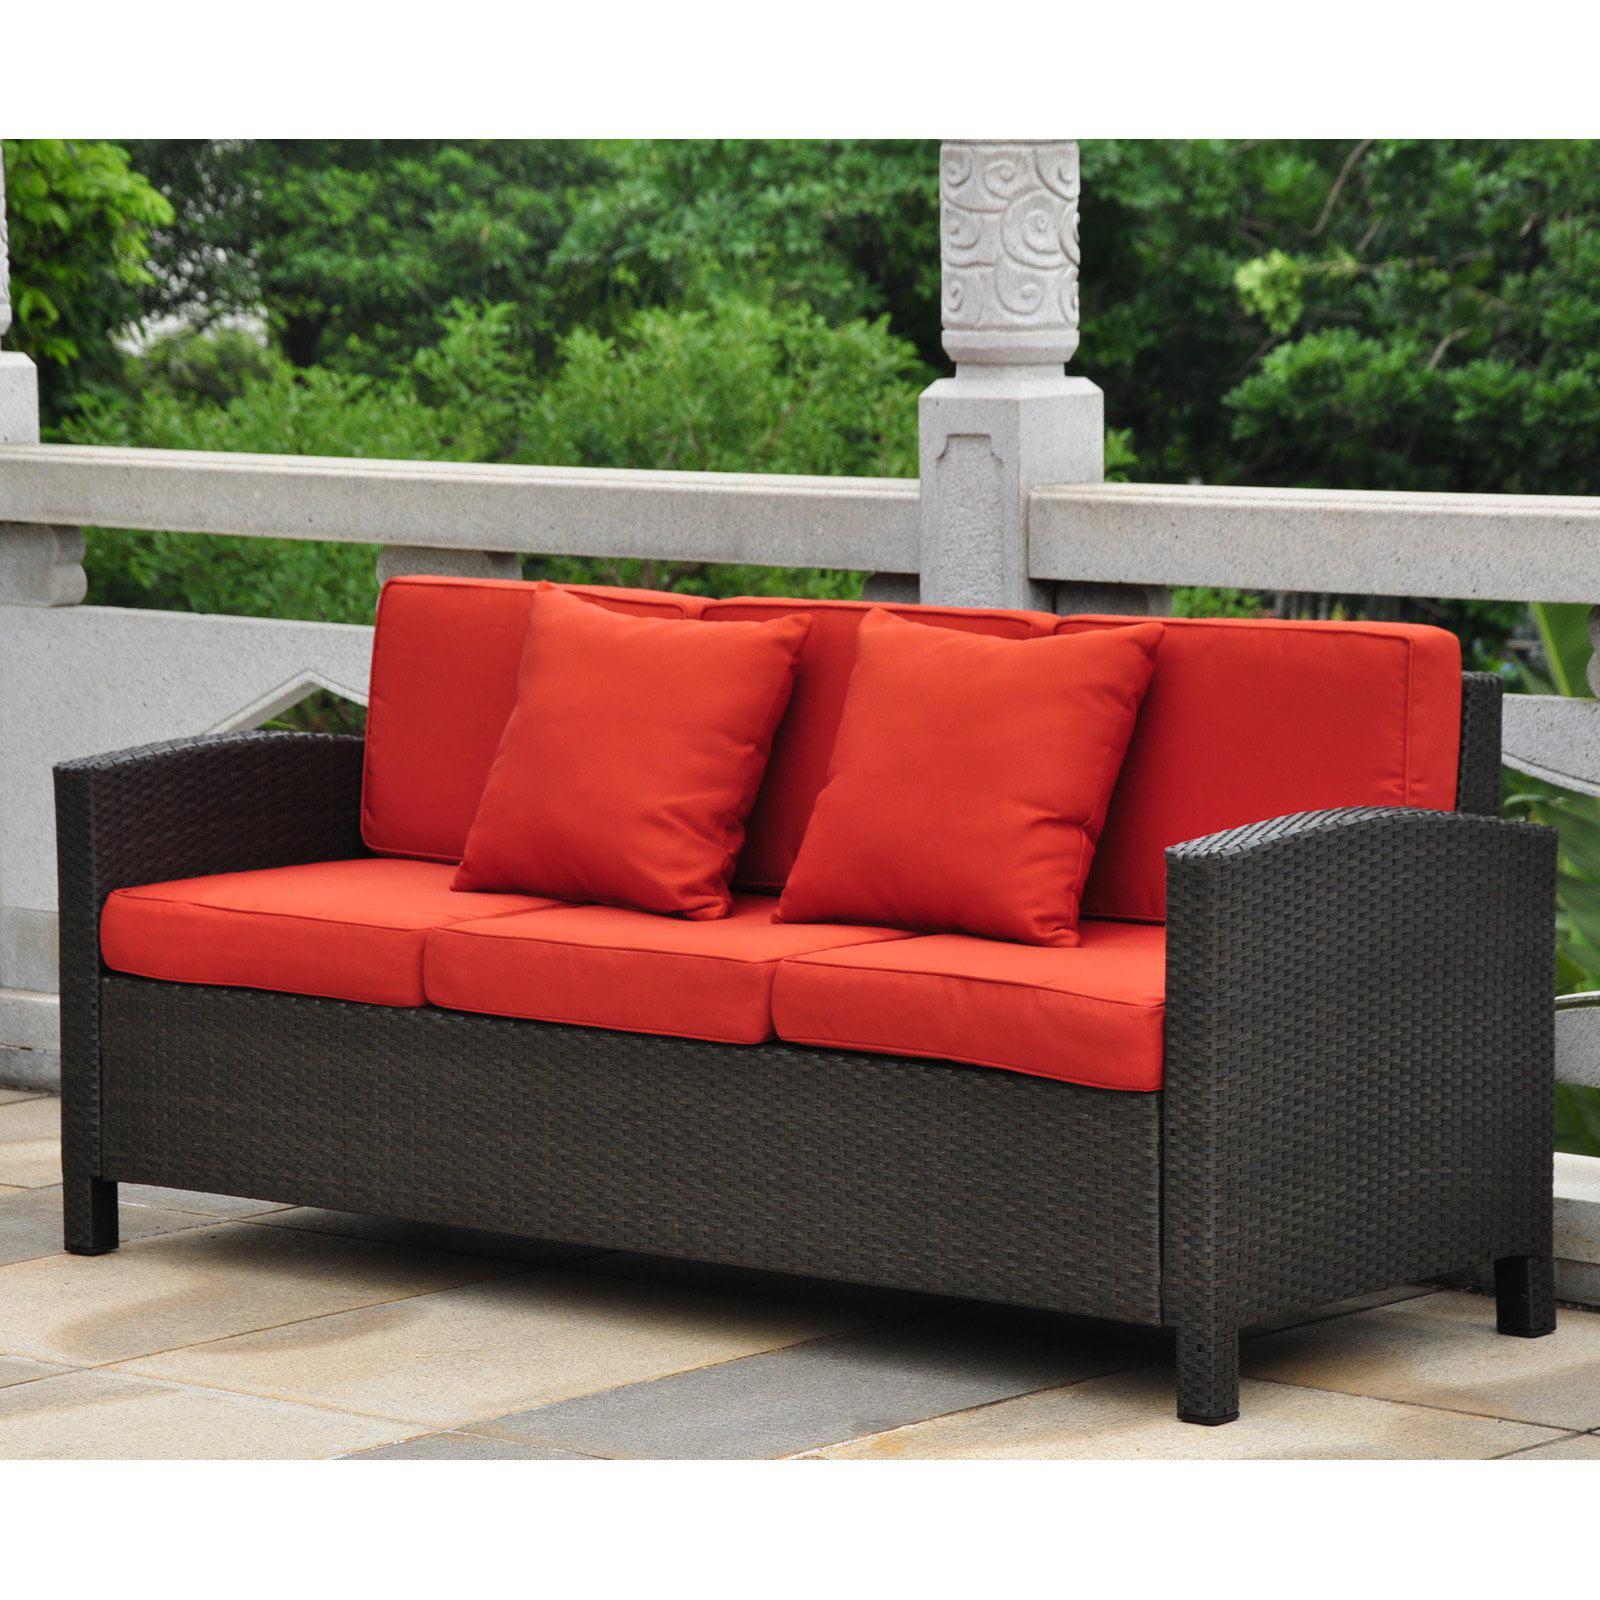 International Caravan Barcelona Resin Wicker Patio Sofa with Cushions by International Caravan & Blazing Needles Inc